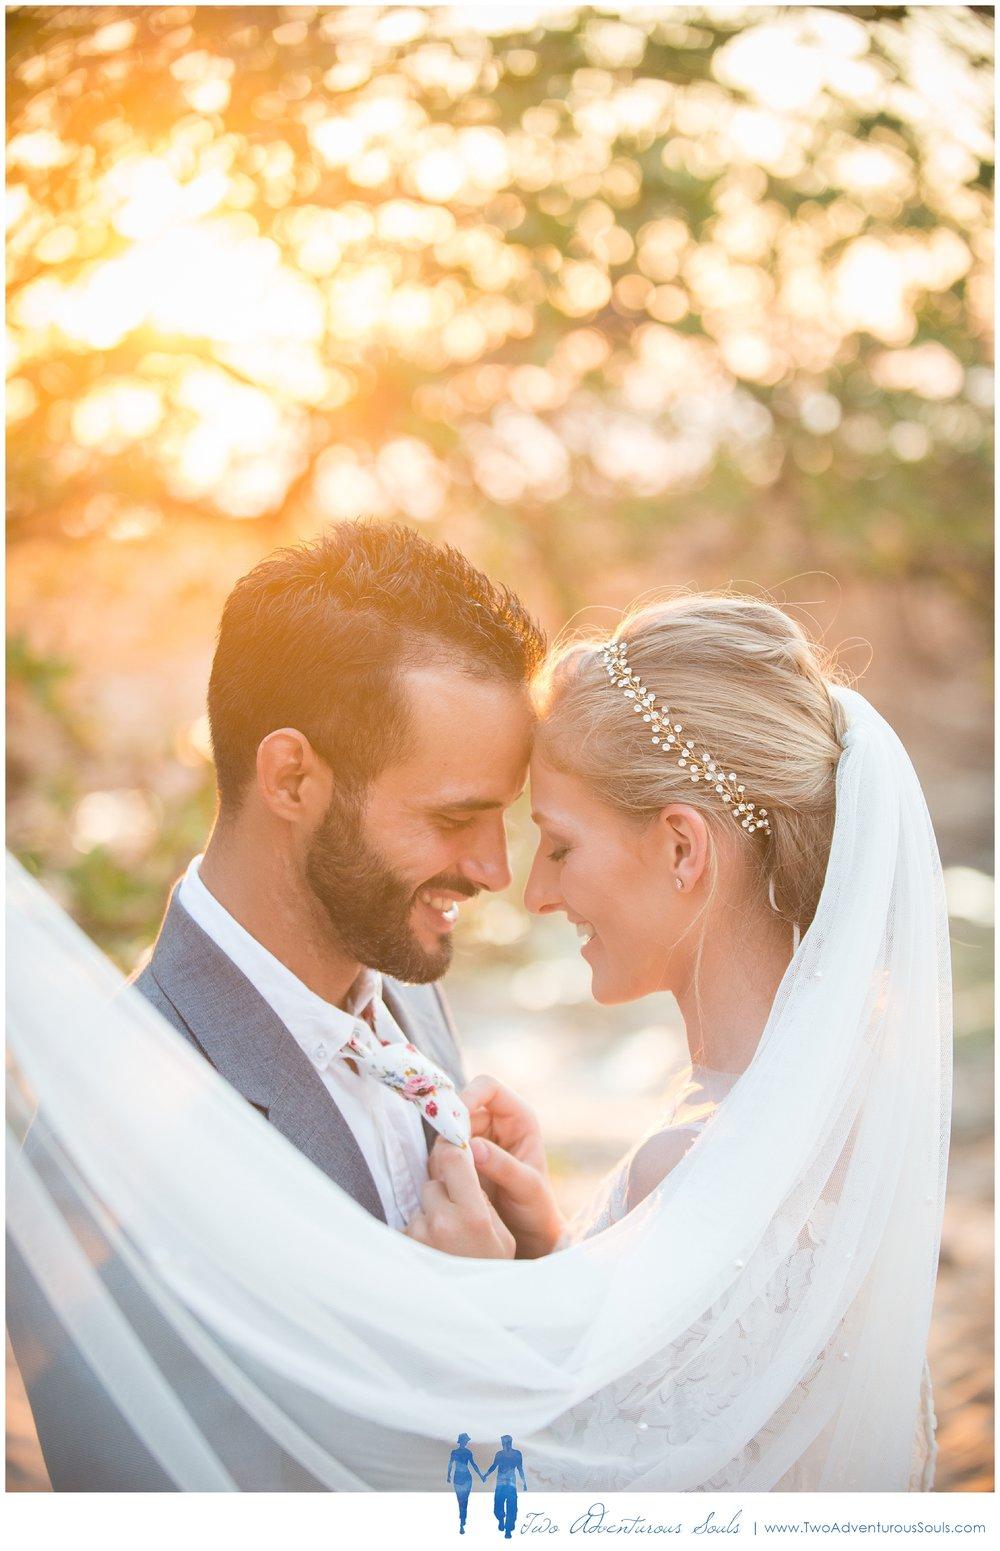 Costa Rica Wedding Photographers, Destination Wedding Photographers, Two Adventurous Souls - Tamarindo Wedding, Playa Langosta,